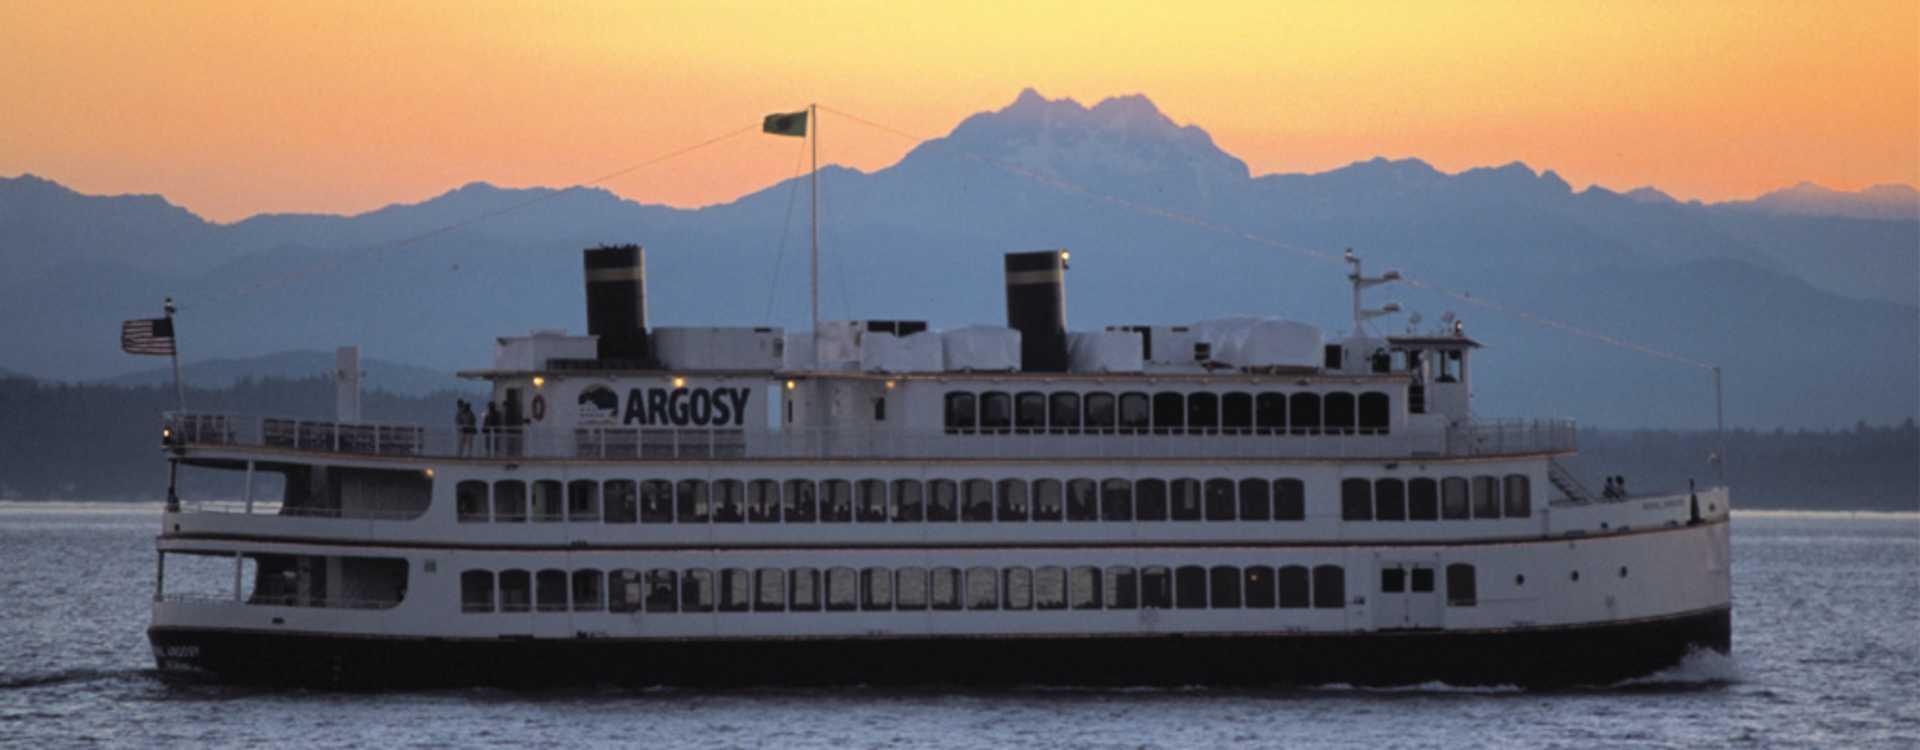 Argosy_Cruises-4.jpg